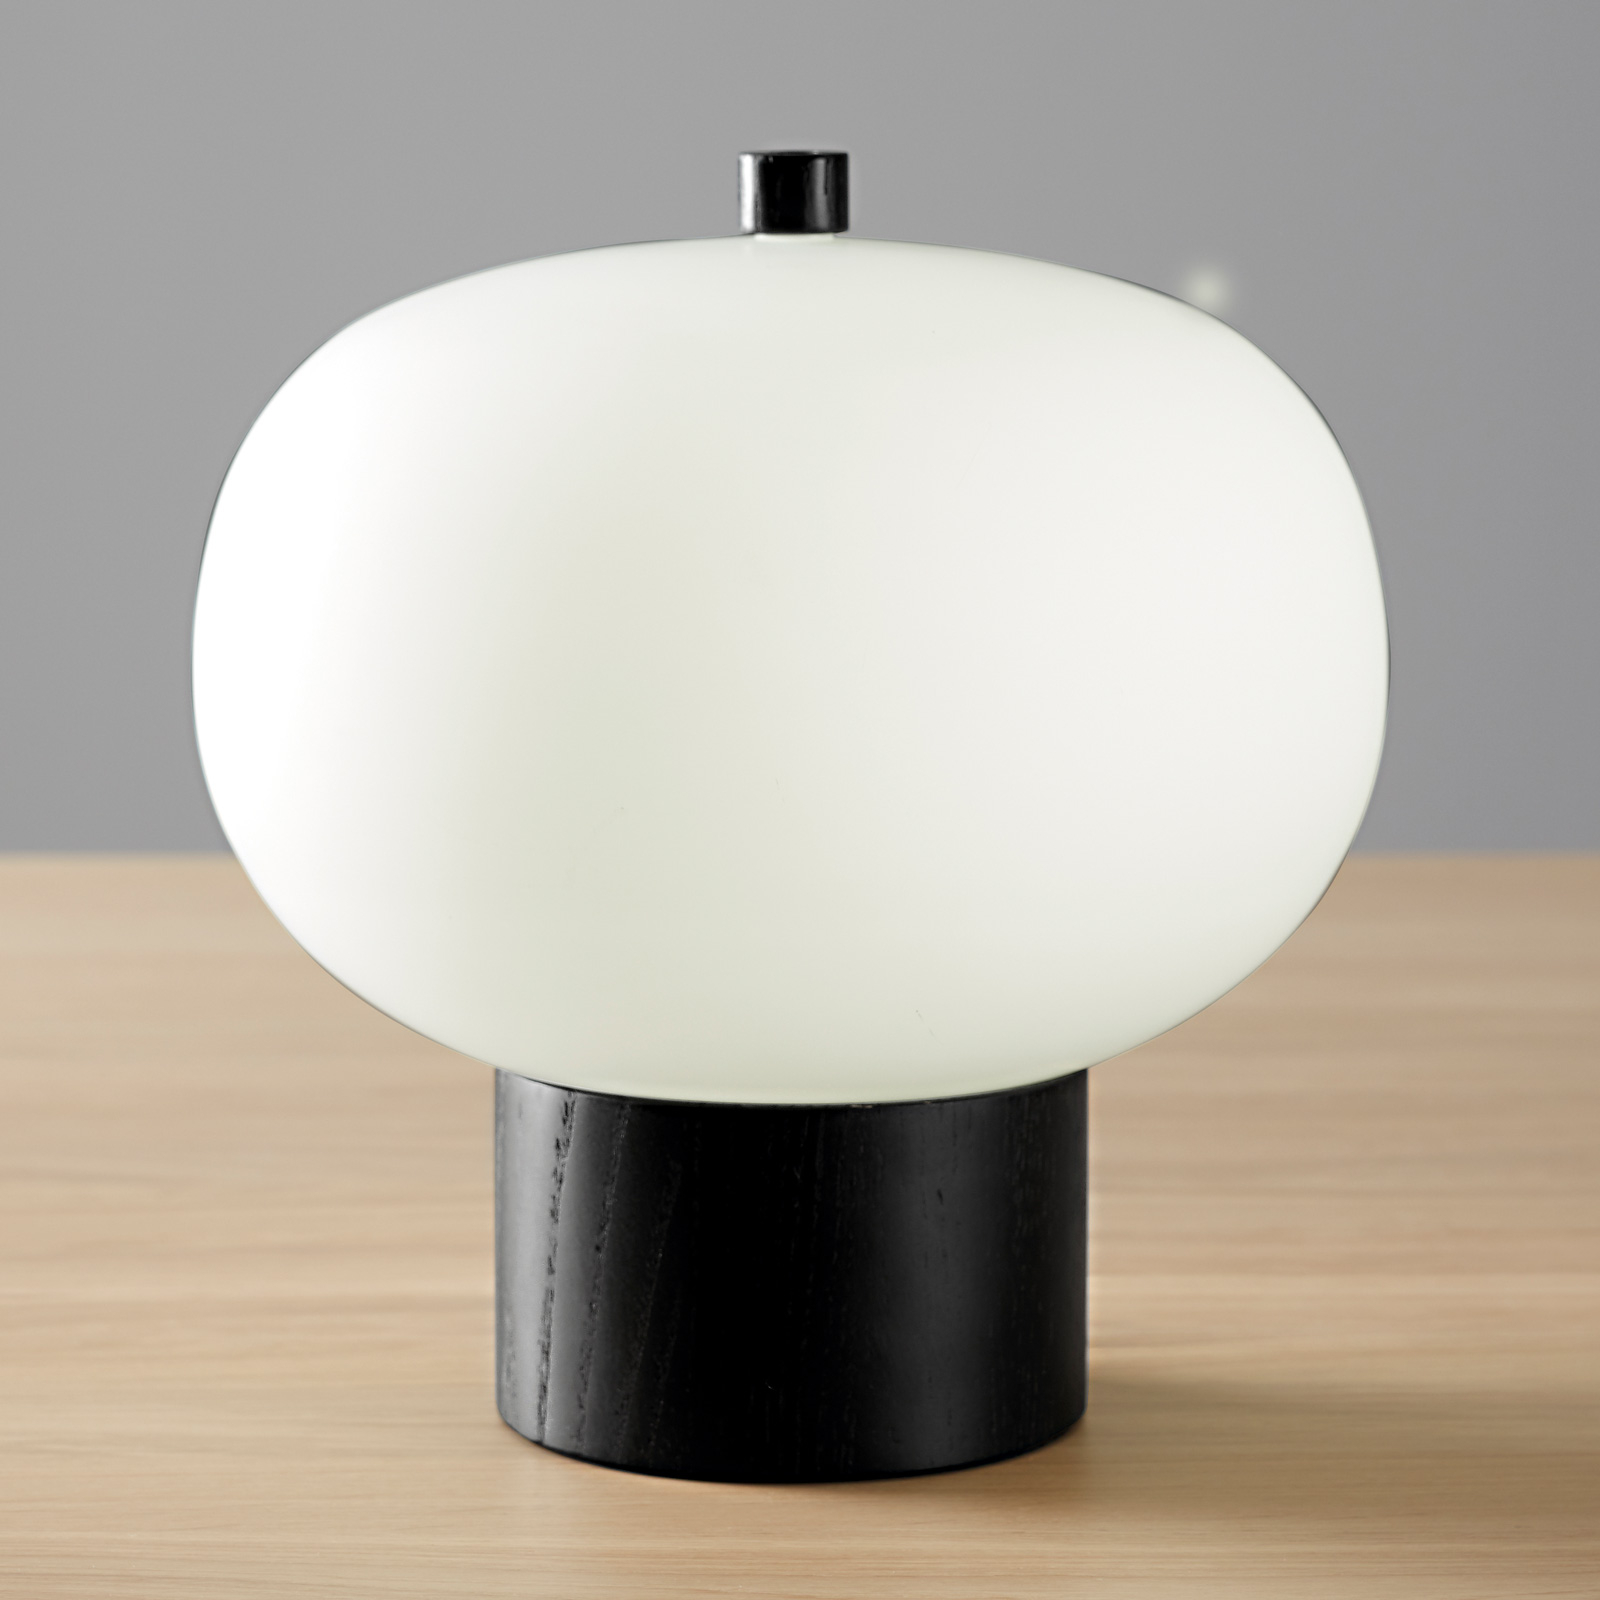 Grok iLargi lampa stołowa LED, Ø24cm ciemny jesion